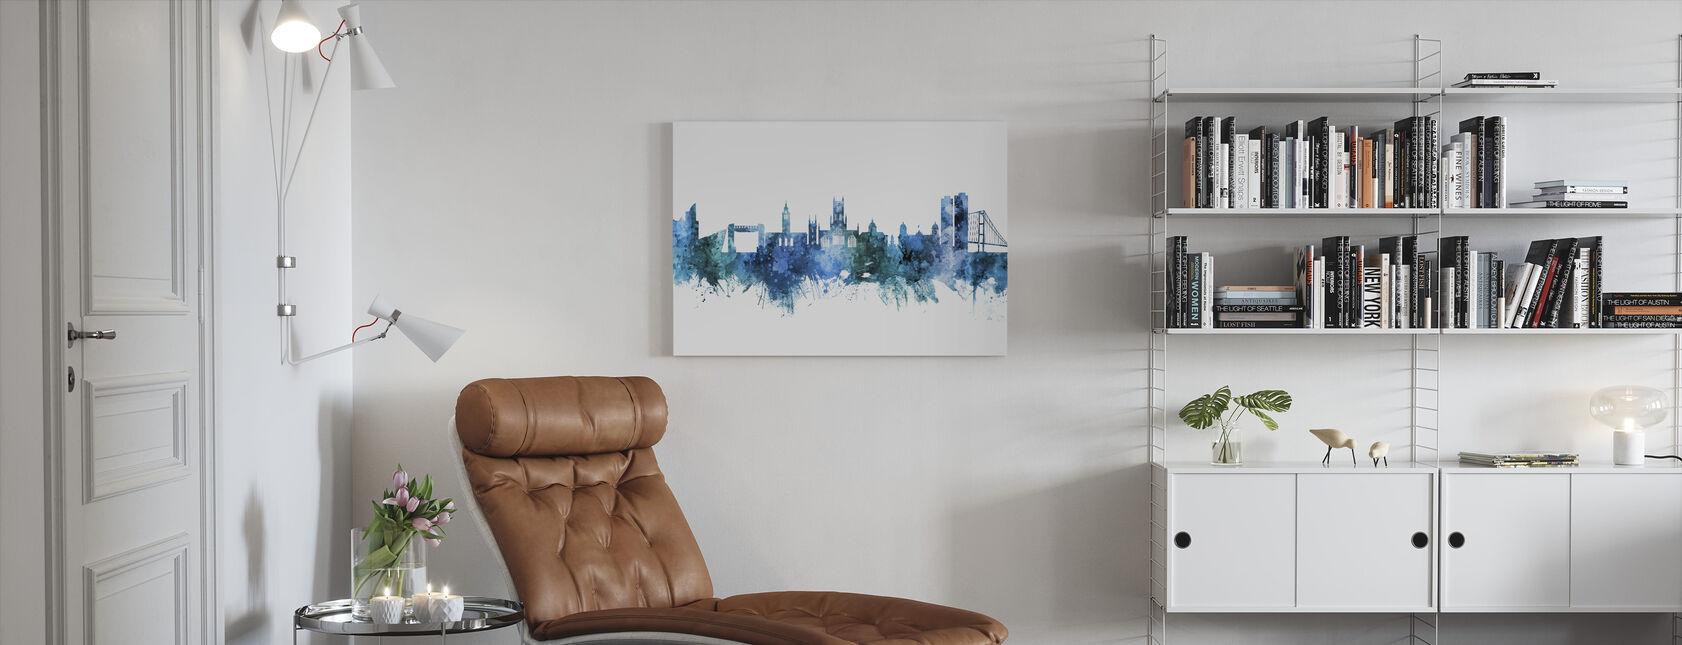 Kingston upon Hull England Skyline - Canvastavla - Vardagsrum